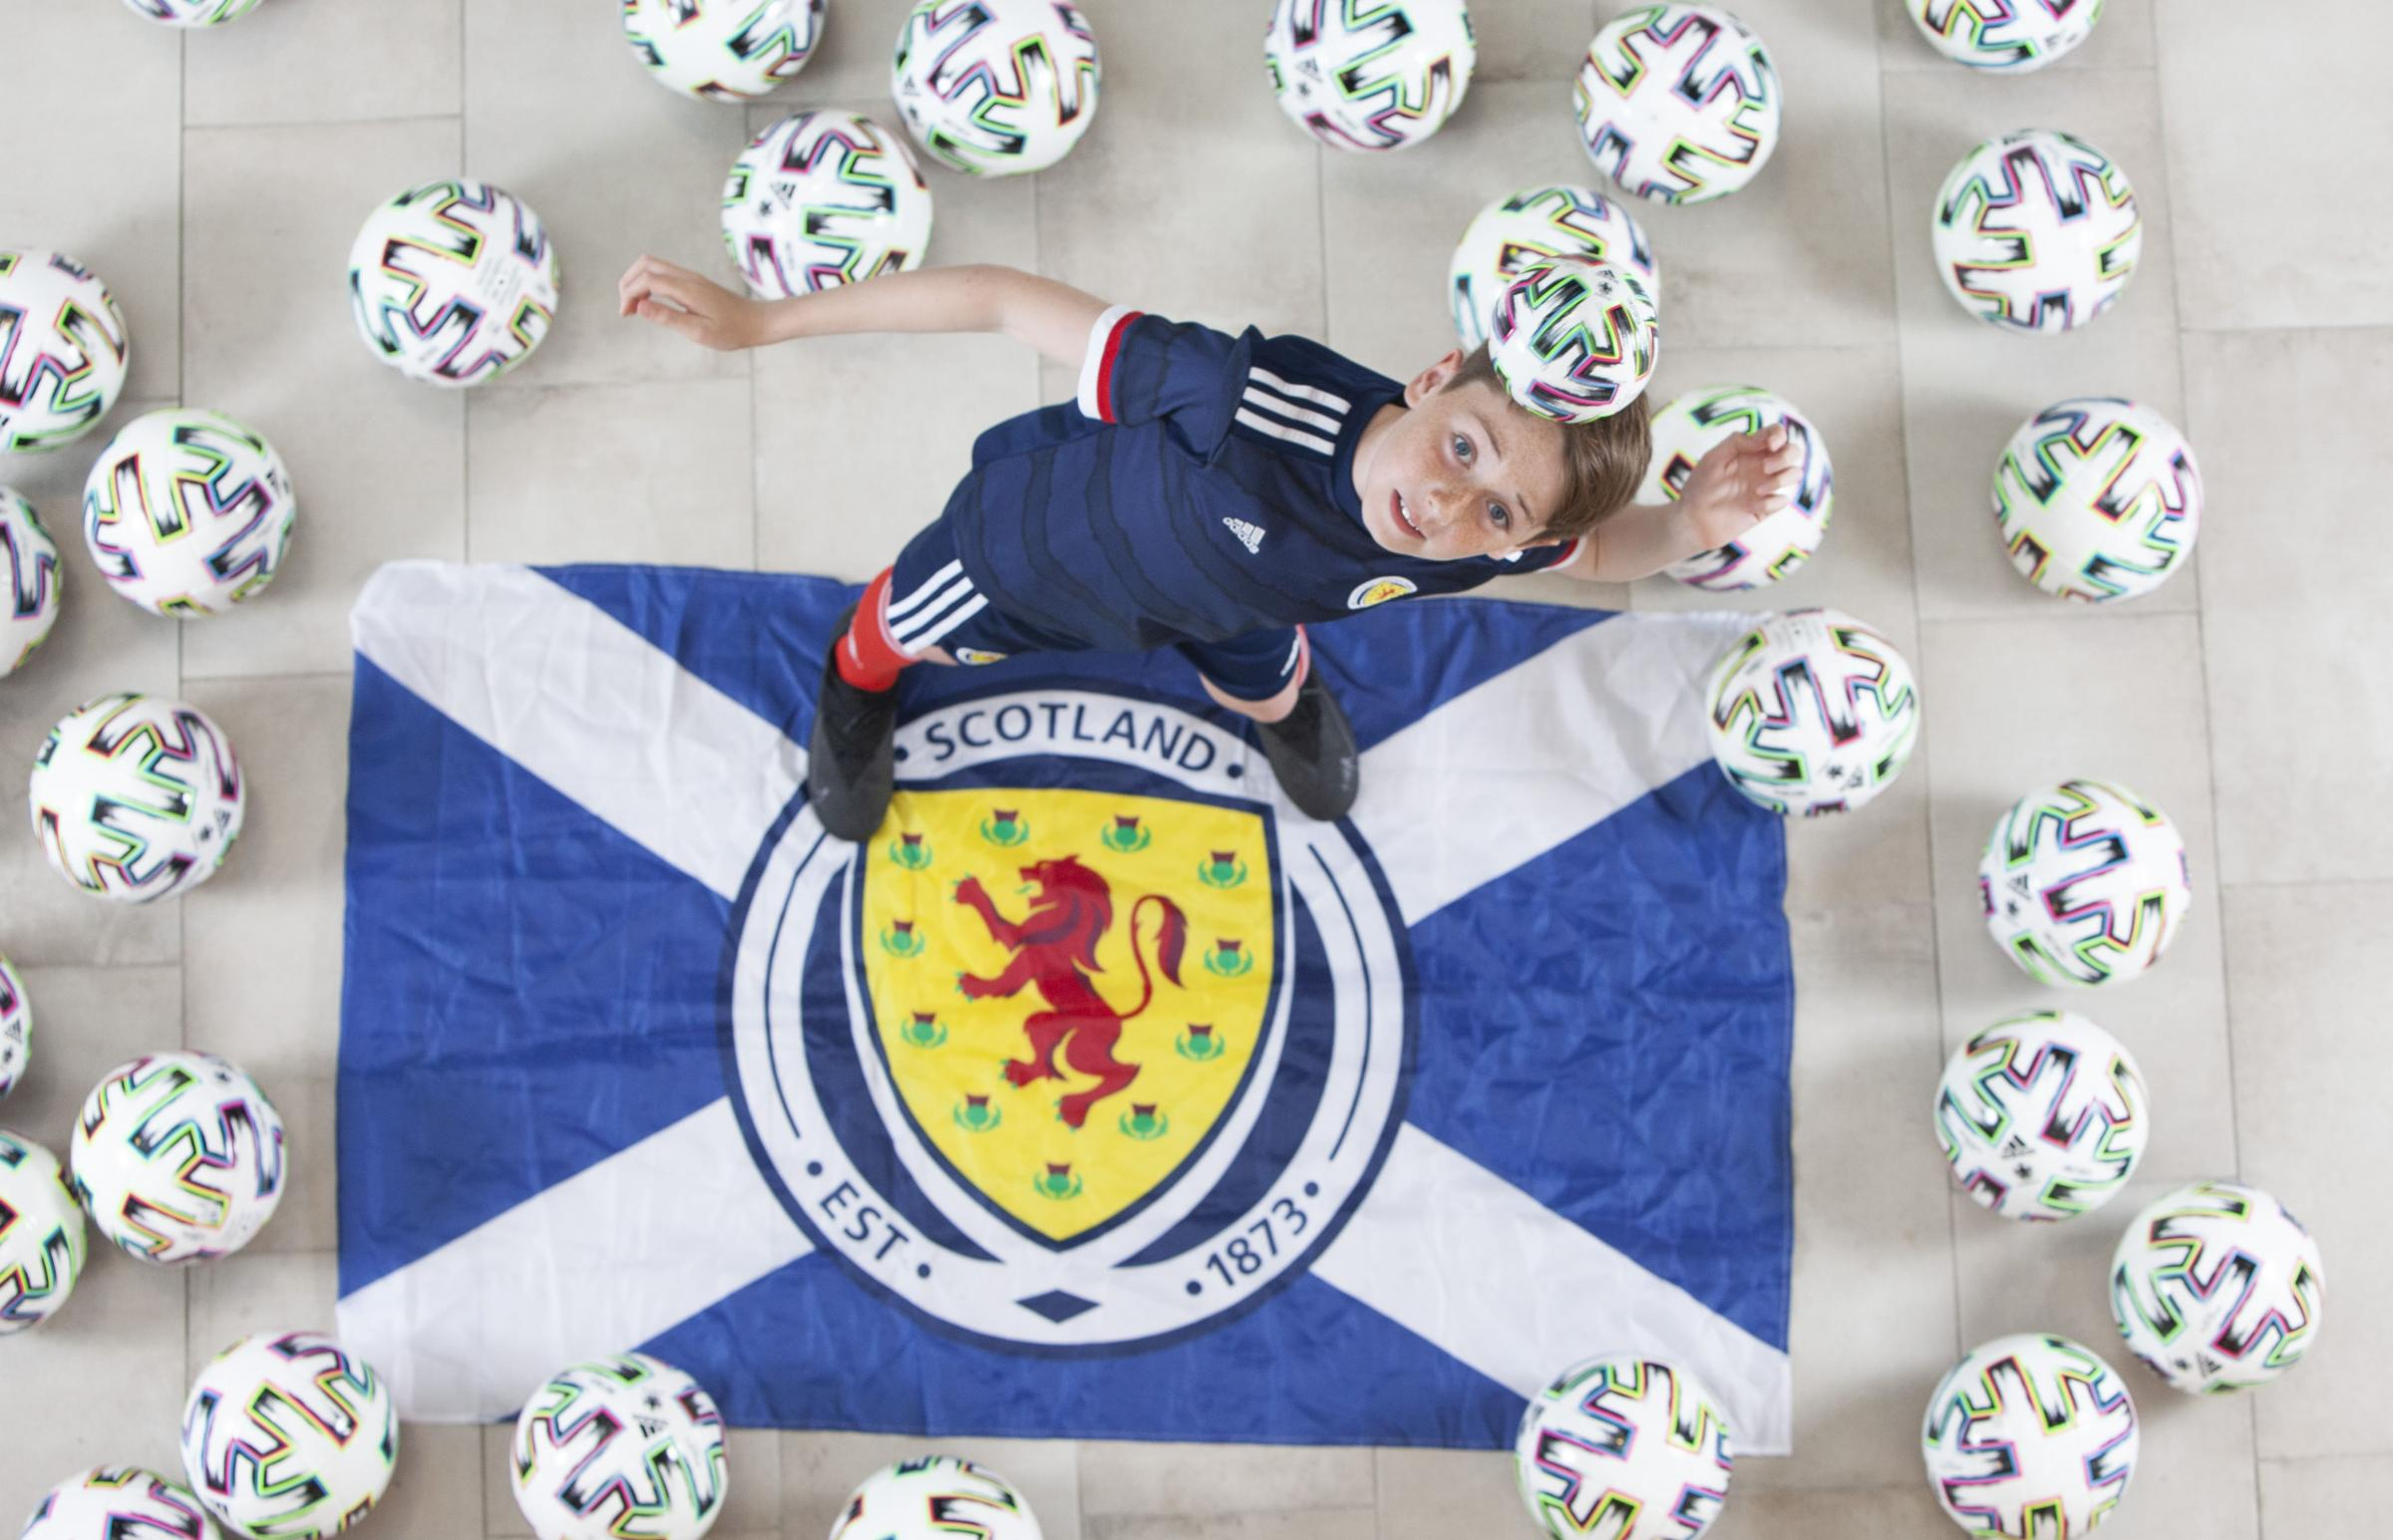 Glasgow St Enoch to give away footballs or goalie gloves depending on Scotland v Czech Republic result